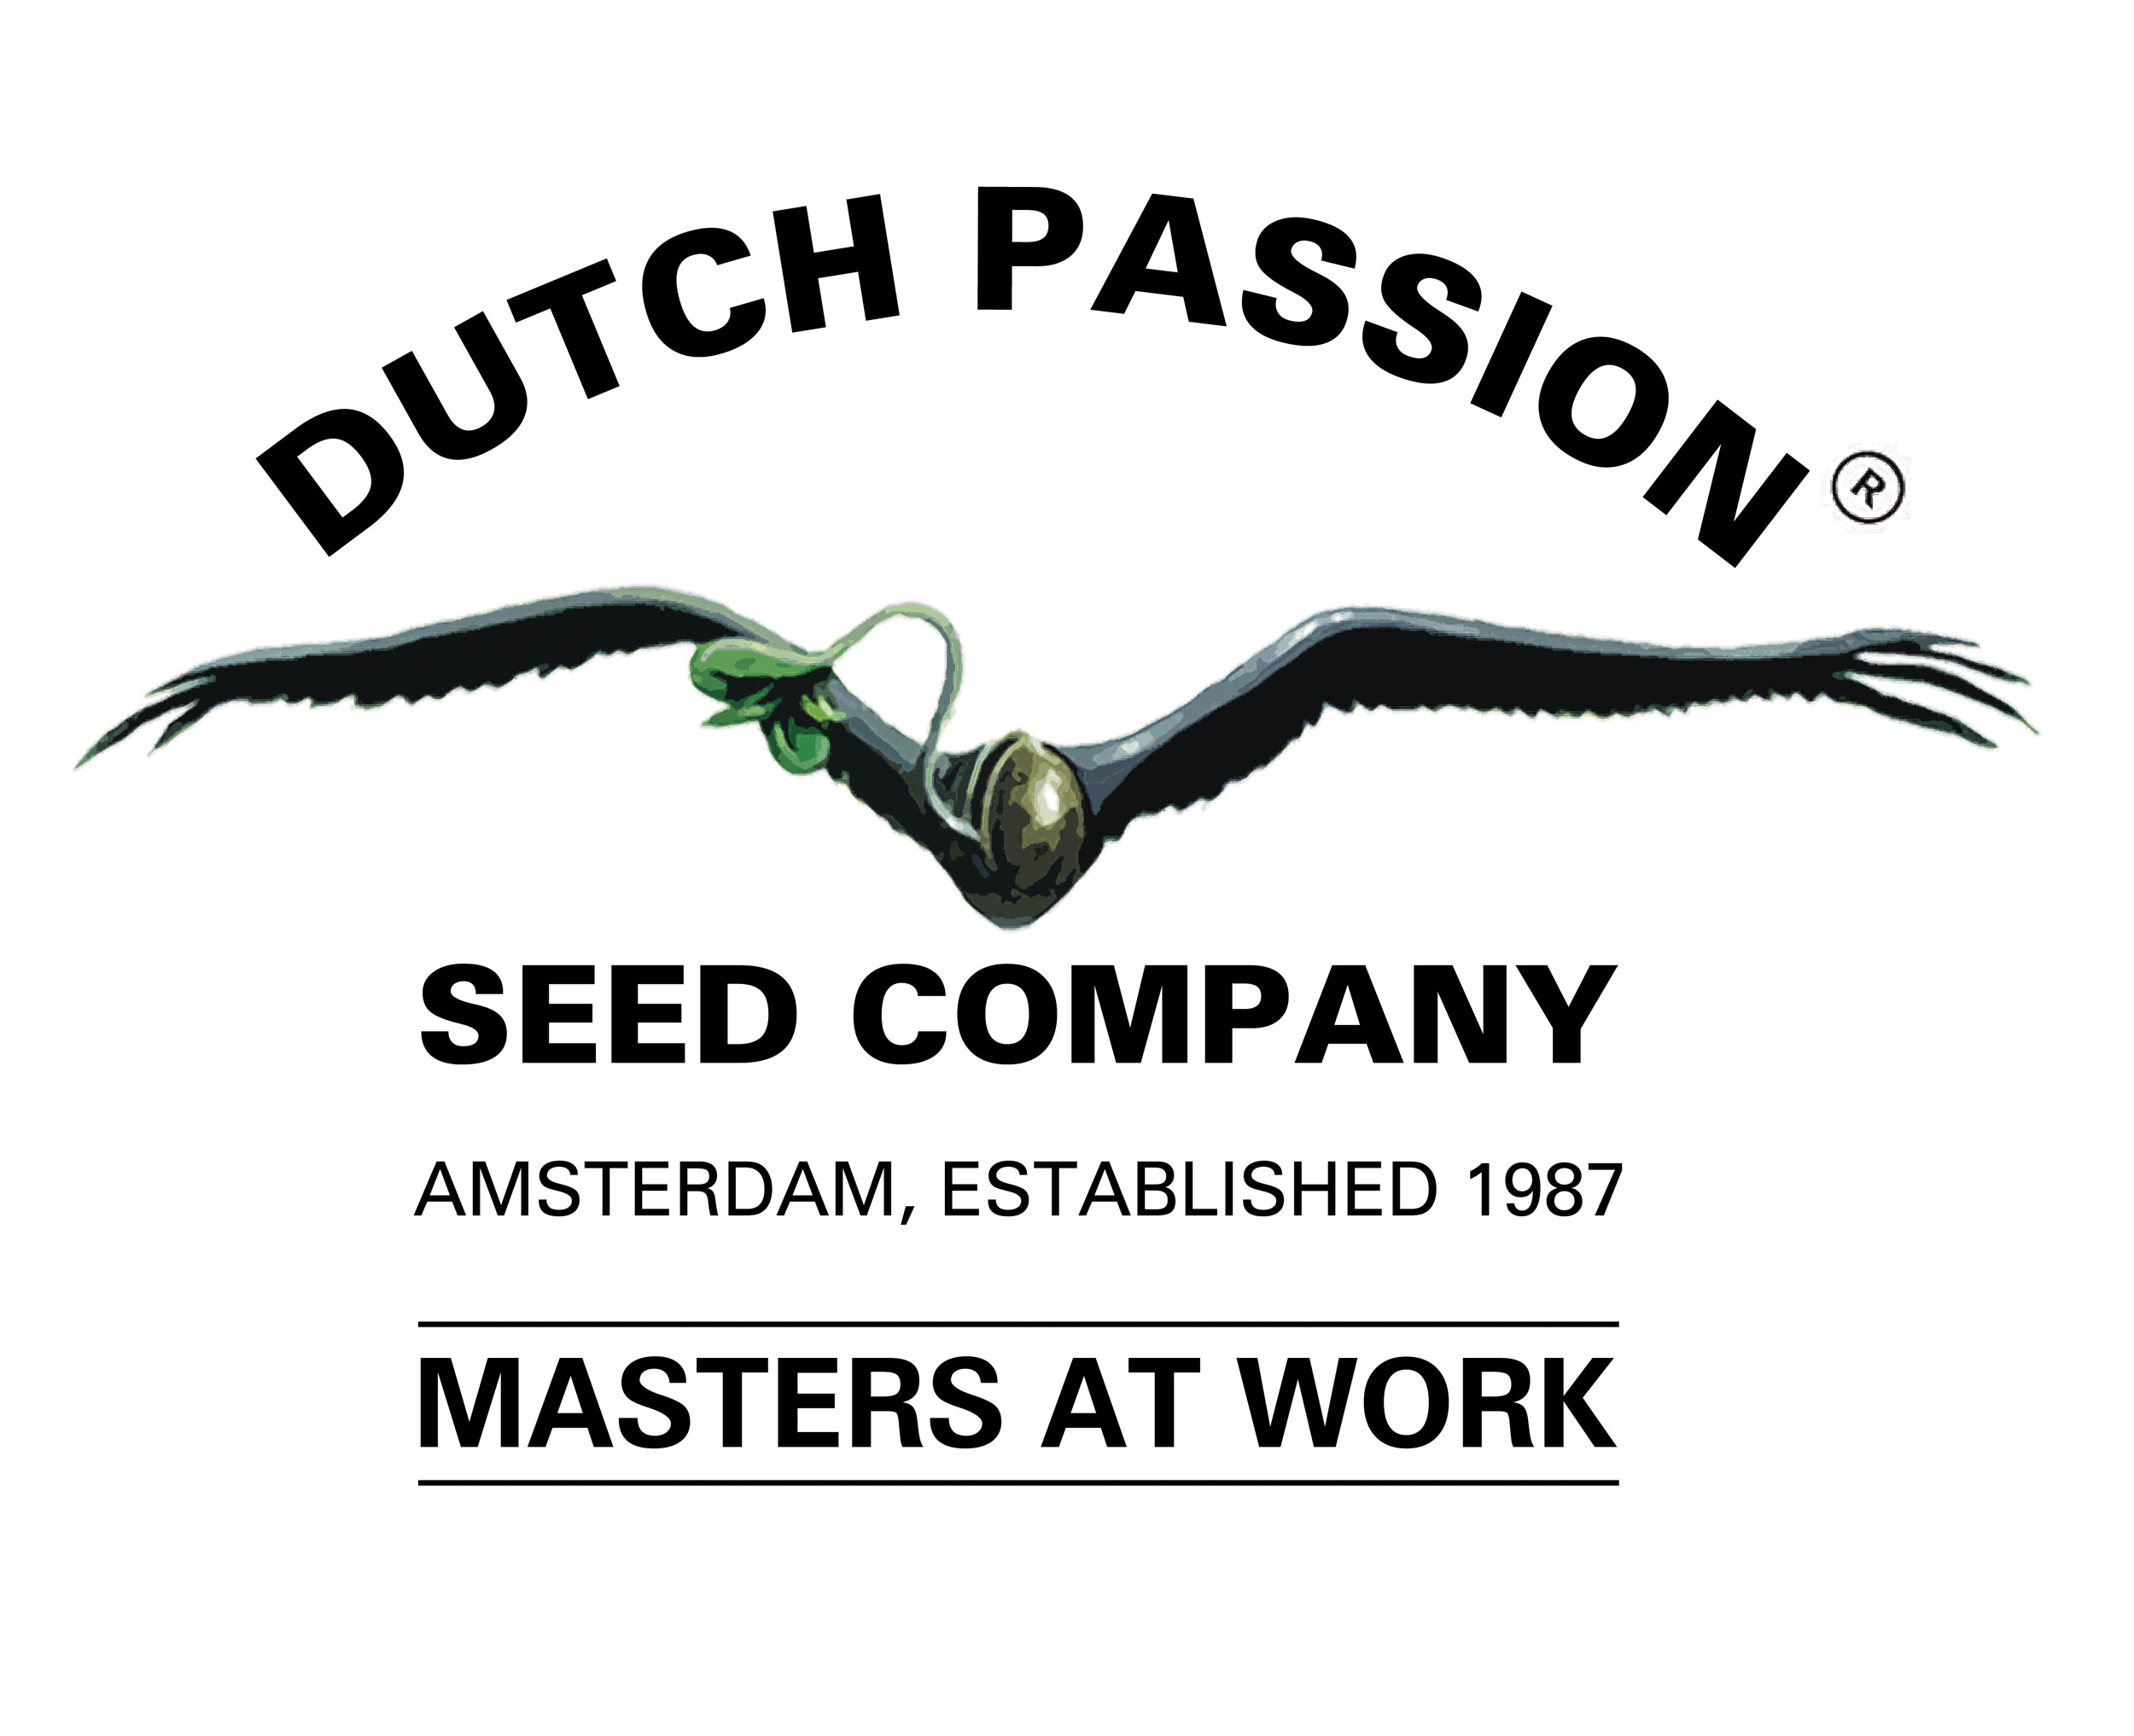 Dutch Passion AutoMazar 7ks (Autoflowering)